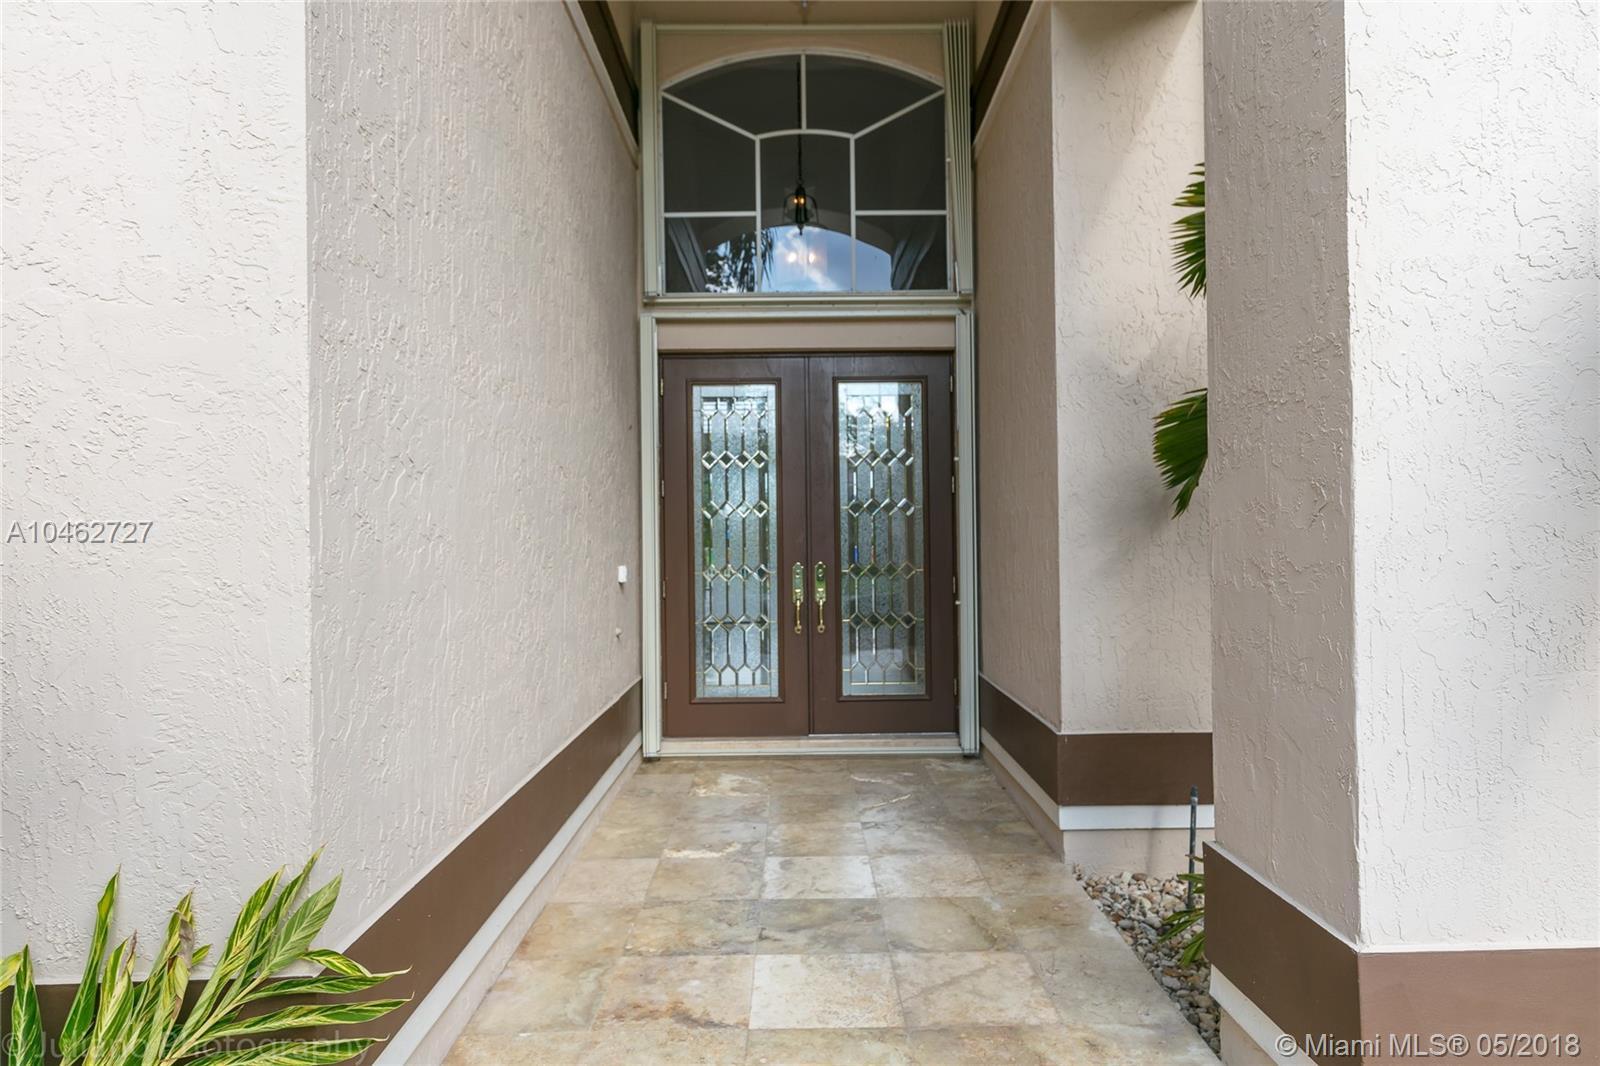 1141 Sw 156th Ave, Pembroke Pines FL, 33027